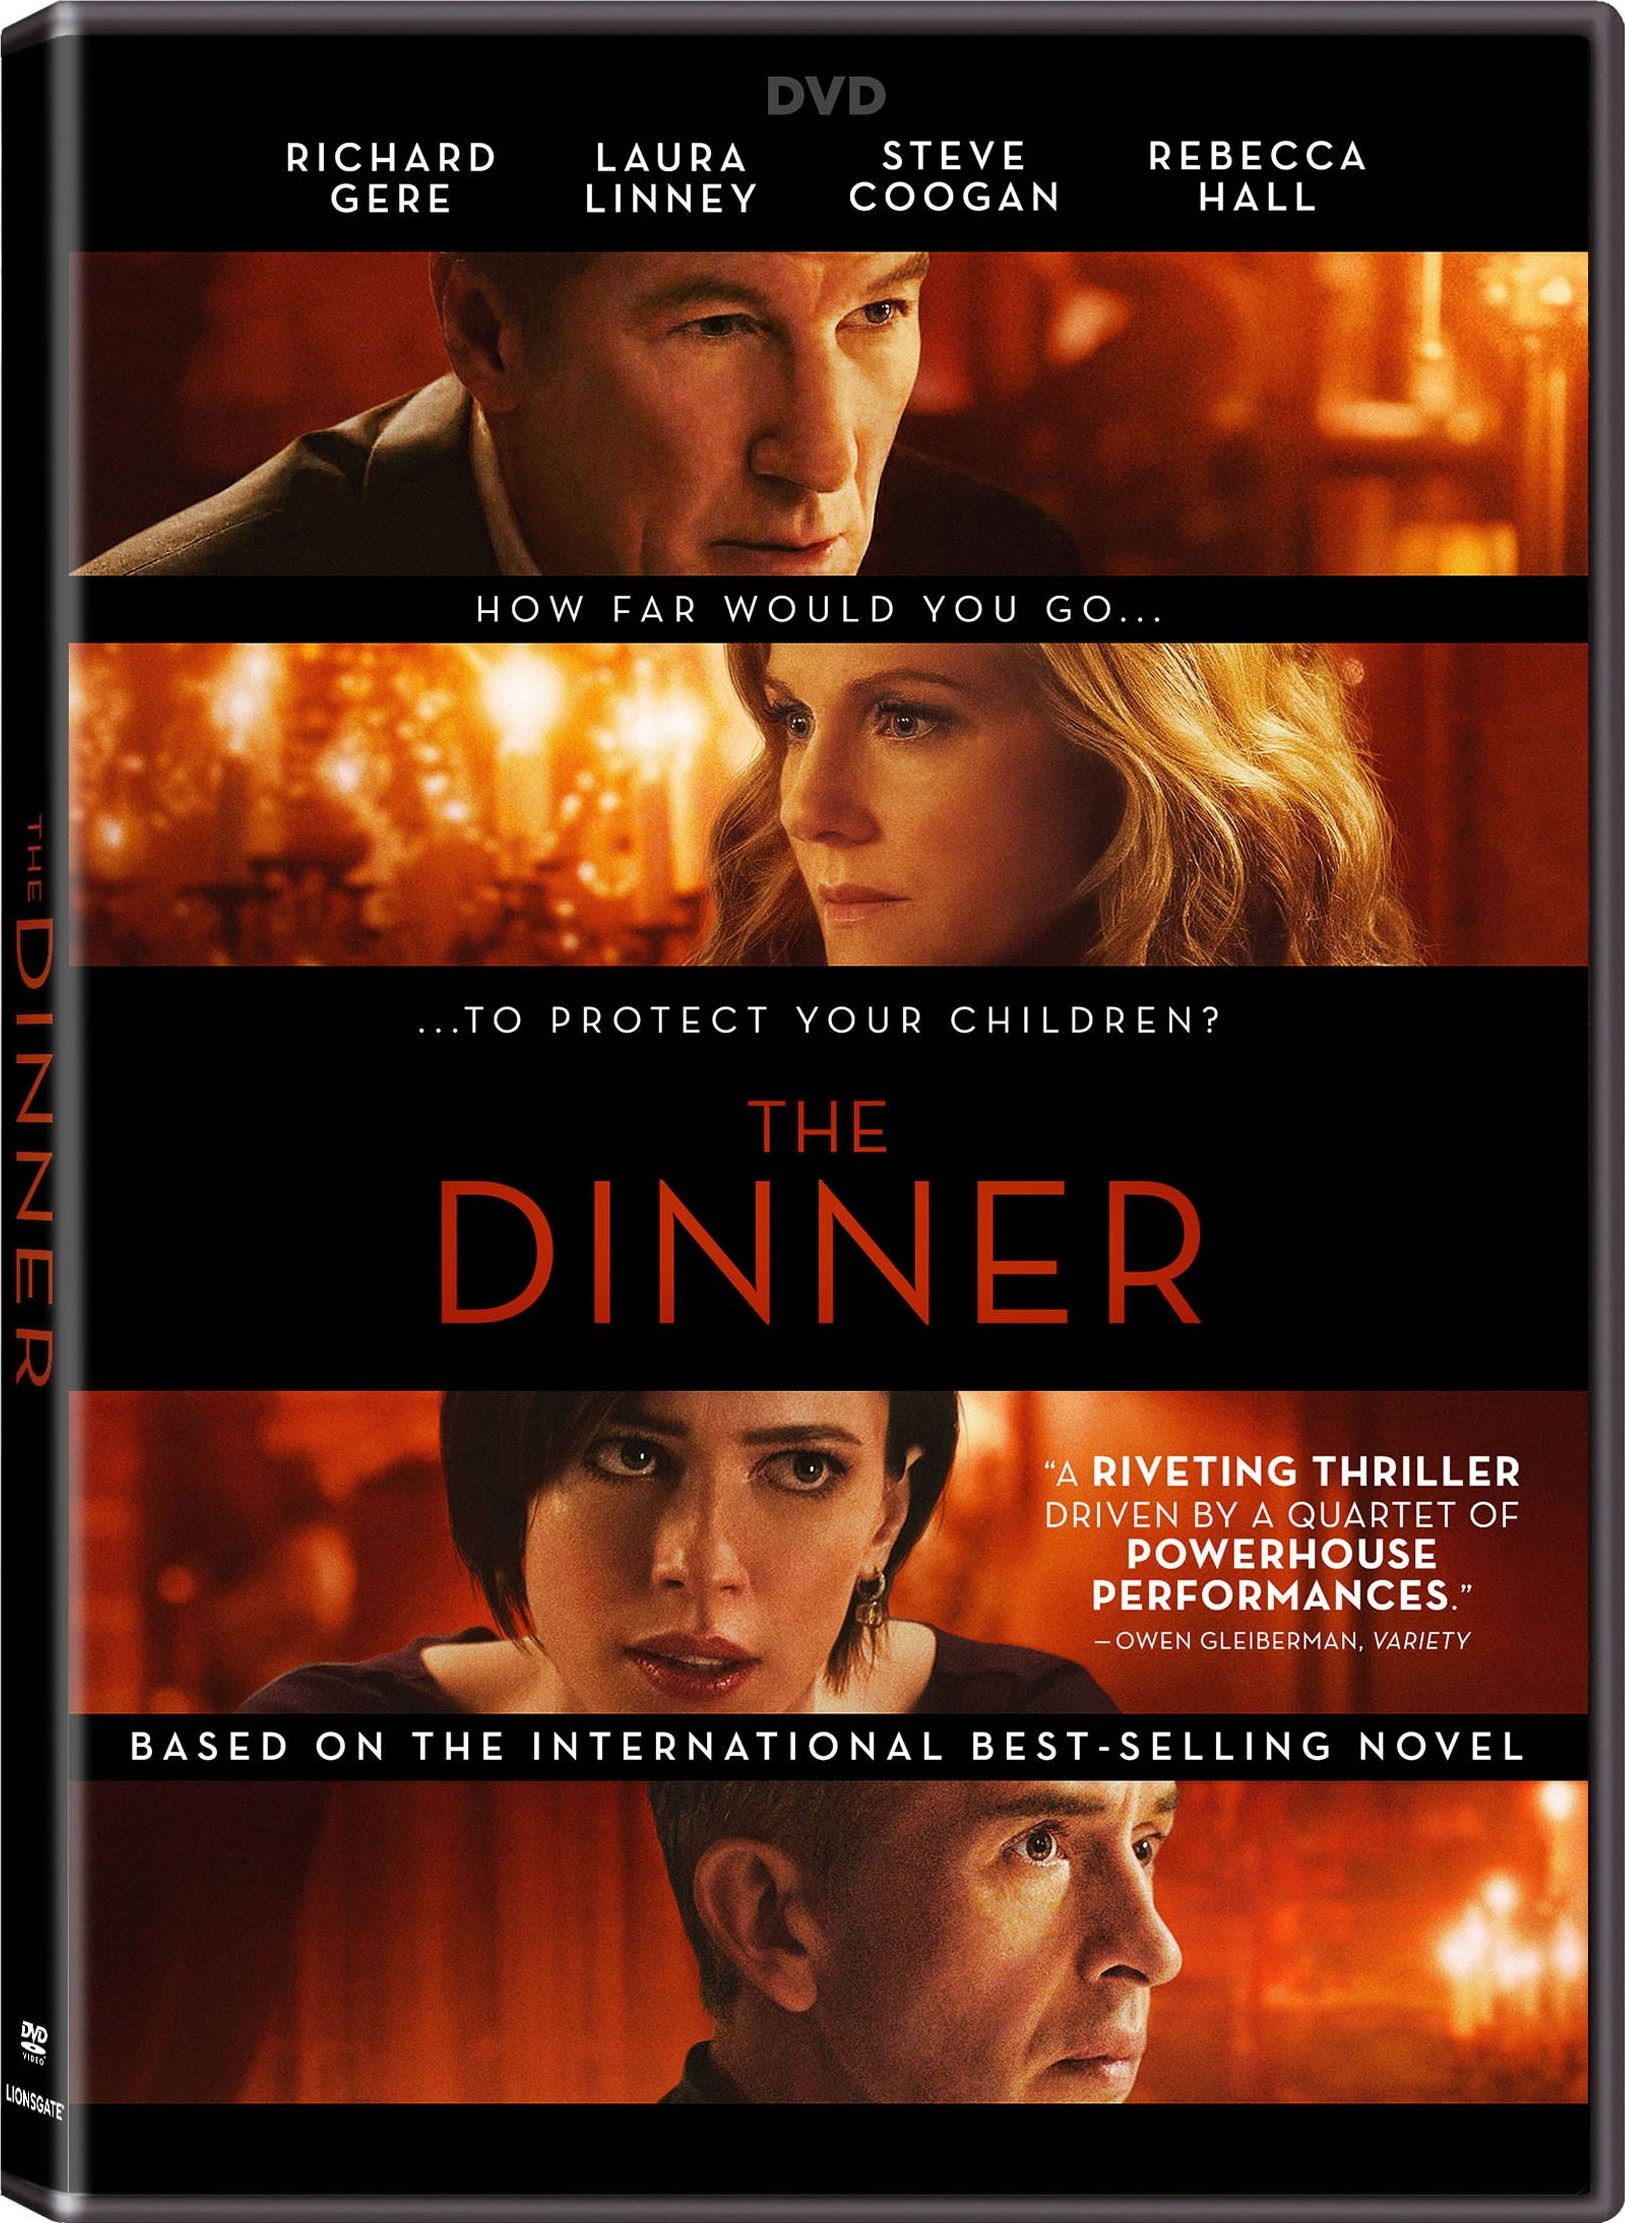 The Dinner Imdb  The Dinner DVD Release Date August 8 2017